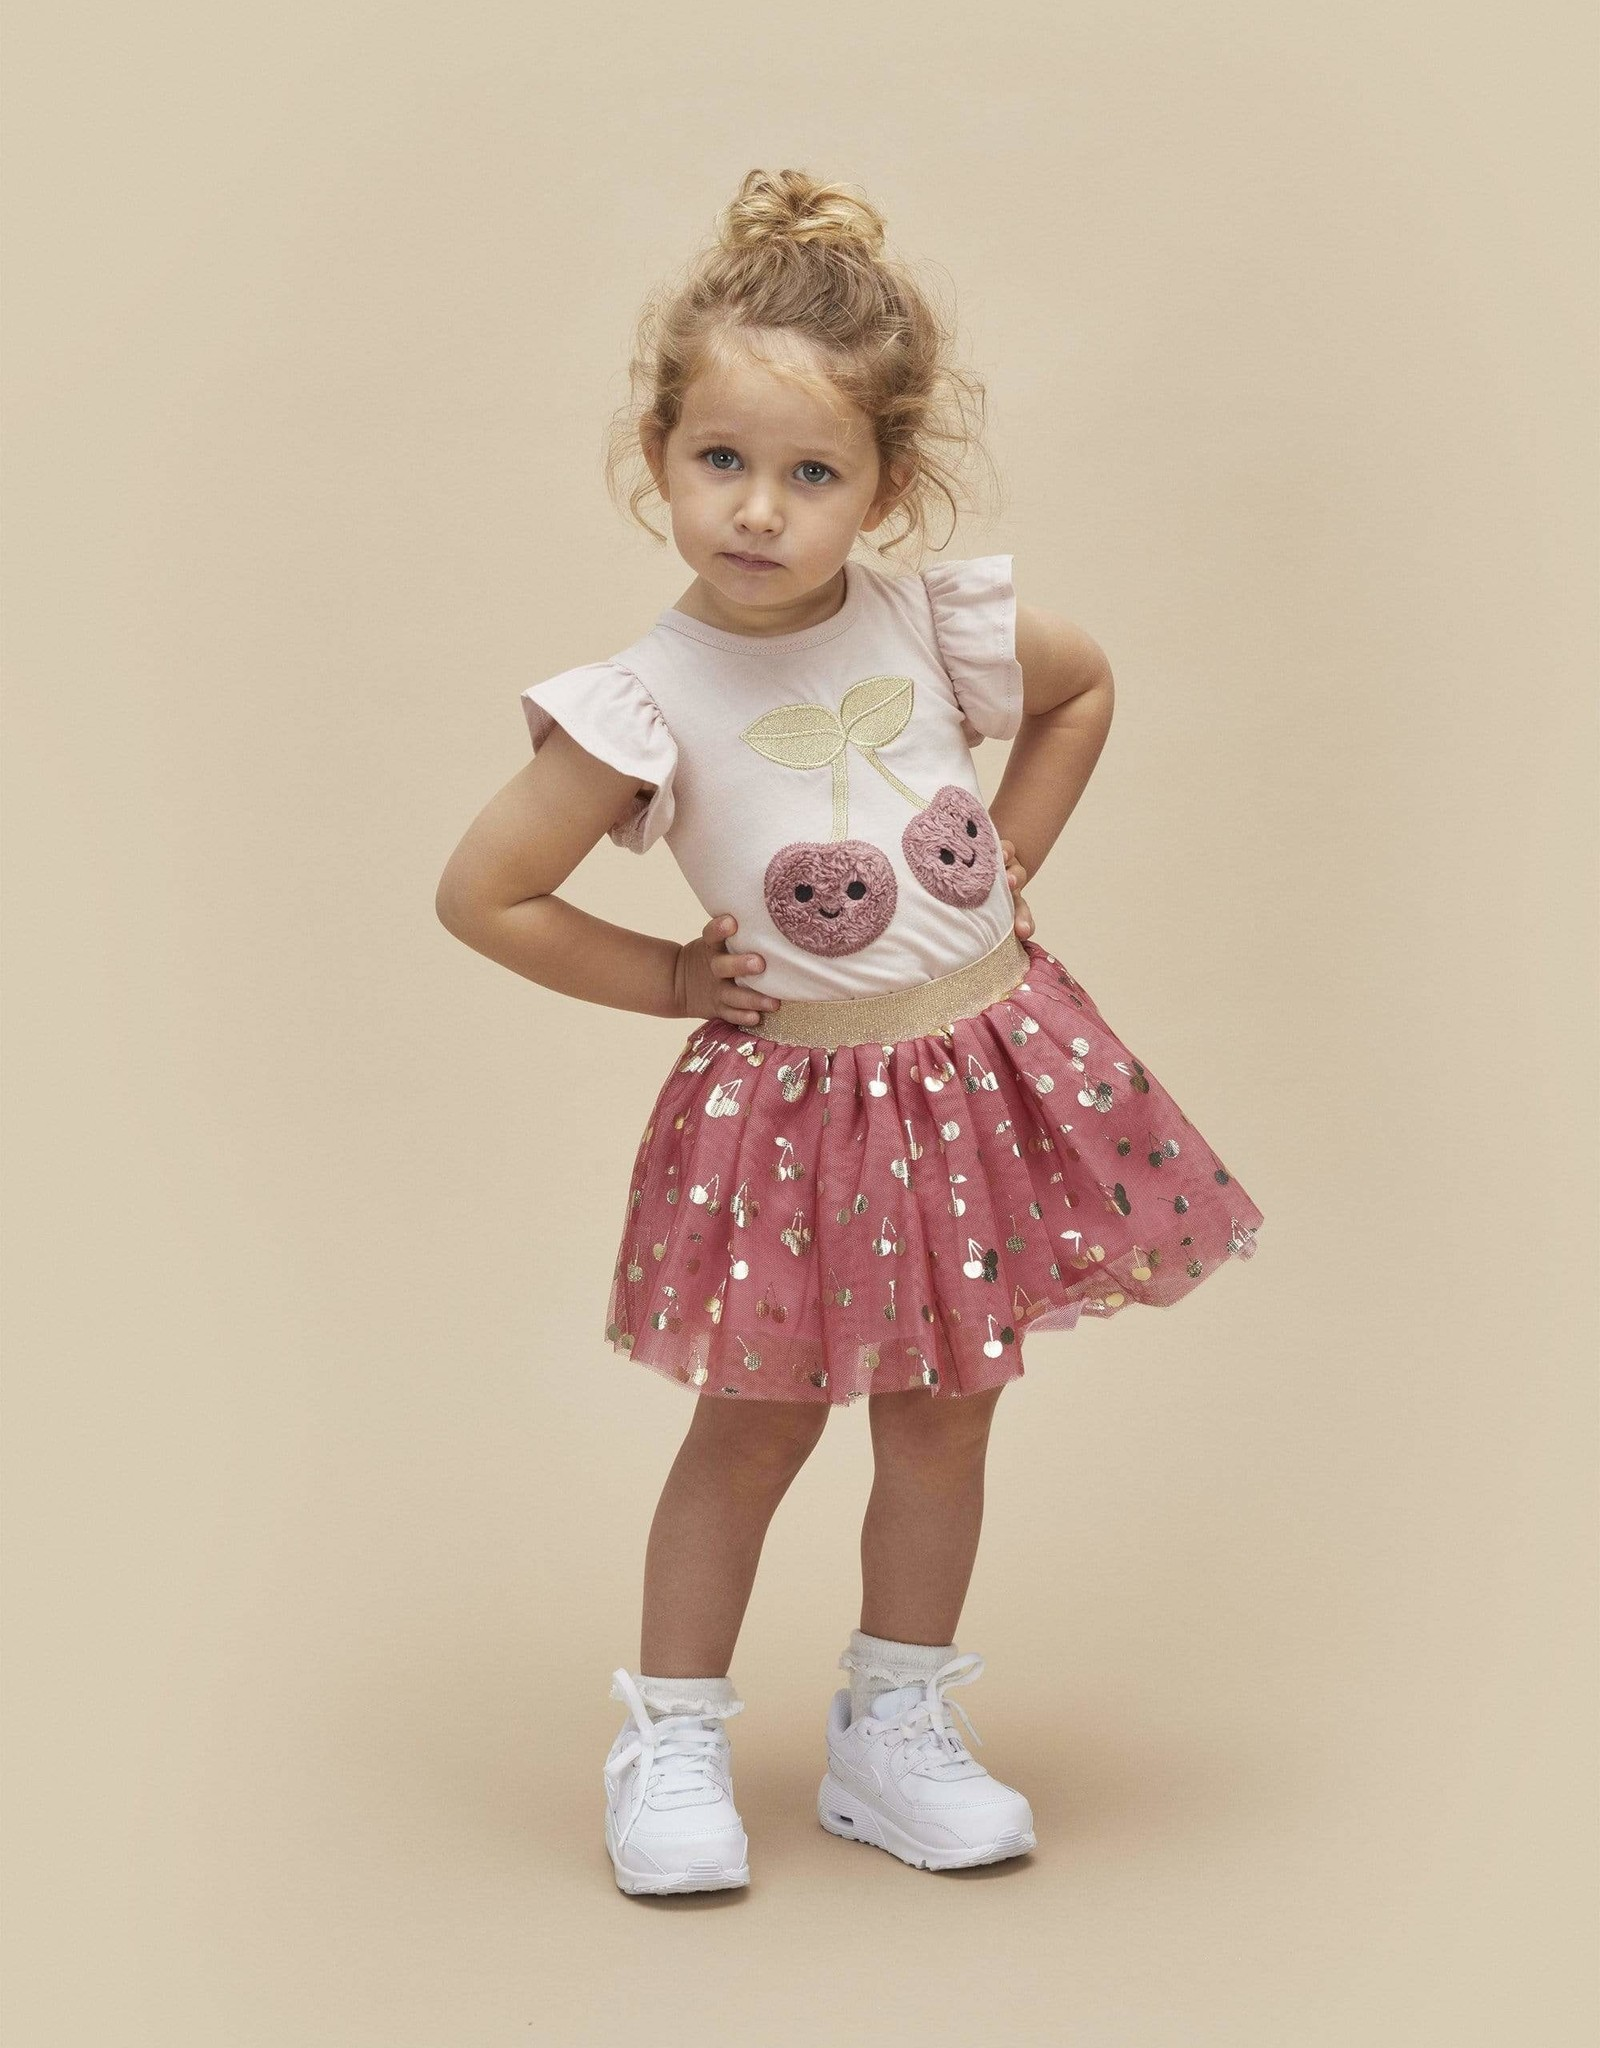 Huxbaby Gold Cherry Tulle Skirt (Berry)